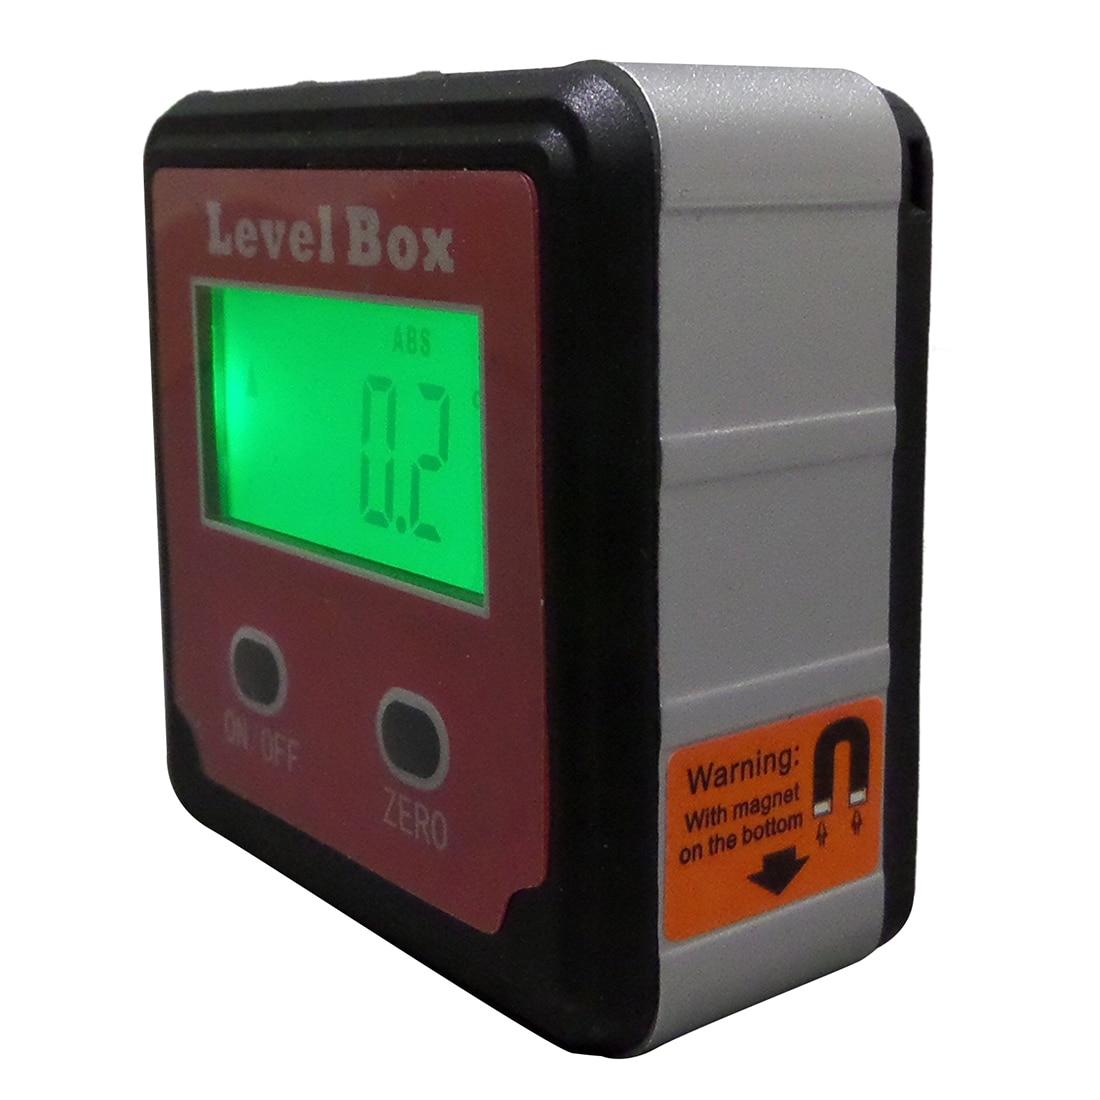 Digital Inclinometer Level Box Protractor Angle Finder